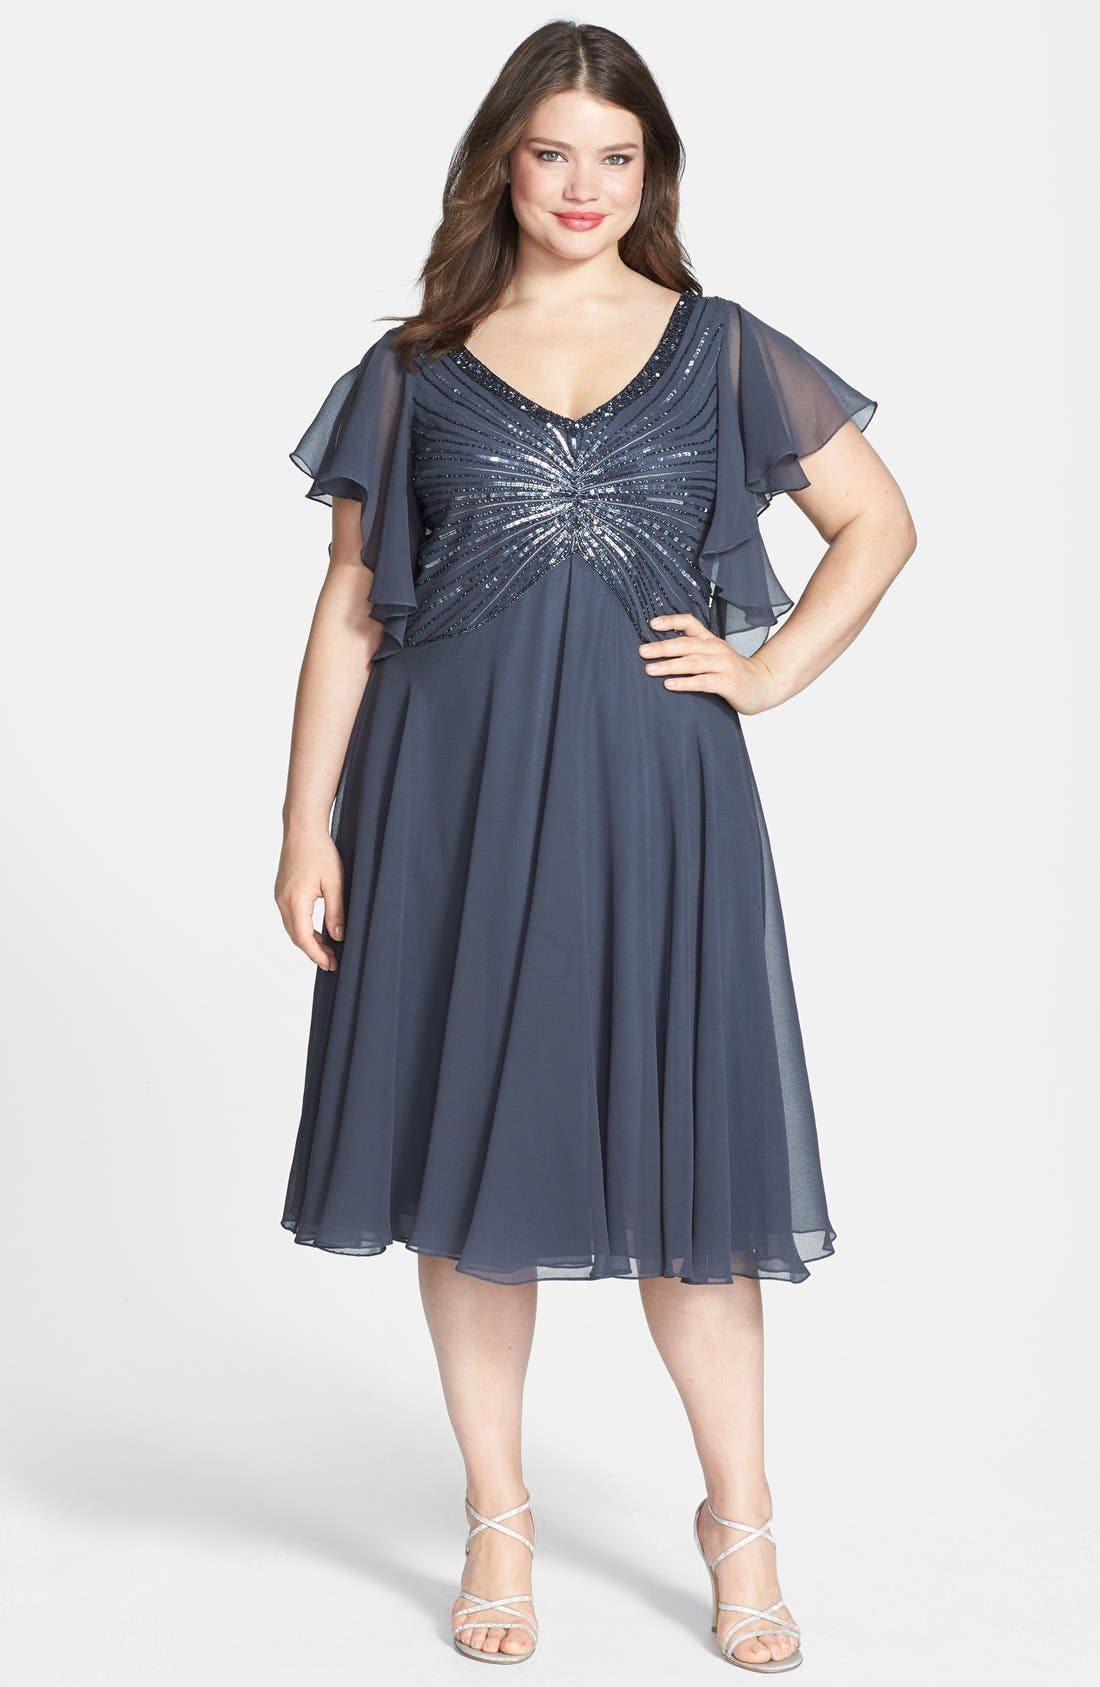 Alternate Image 1 Selected - J Kara Beaded Dress (Plus Size)